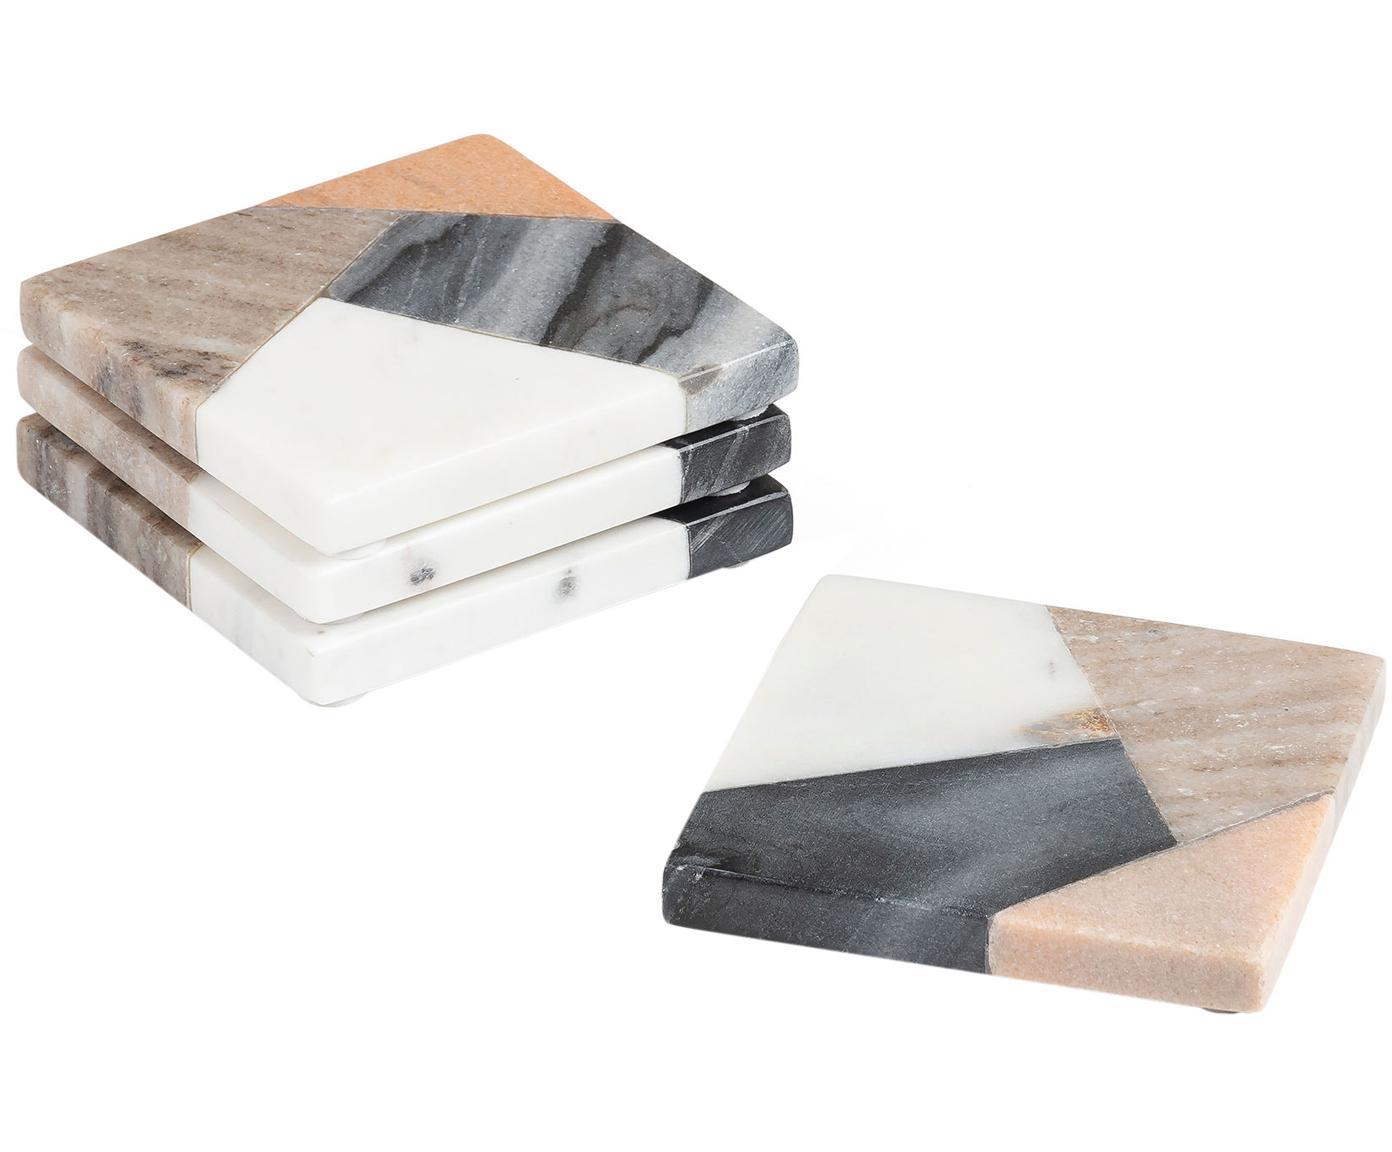 Marmor-Untersetzer-Set Bradney, 4-tlg., Keramik, Marmor, Mehrfarbig, B 10 x T 10 cm